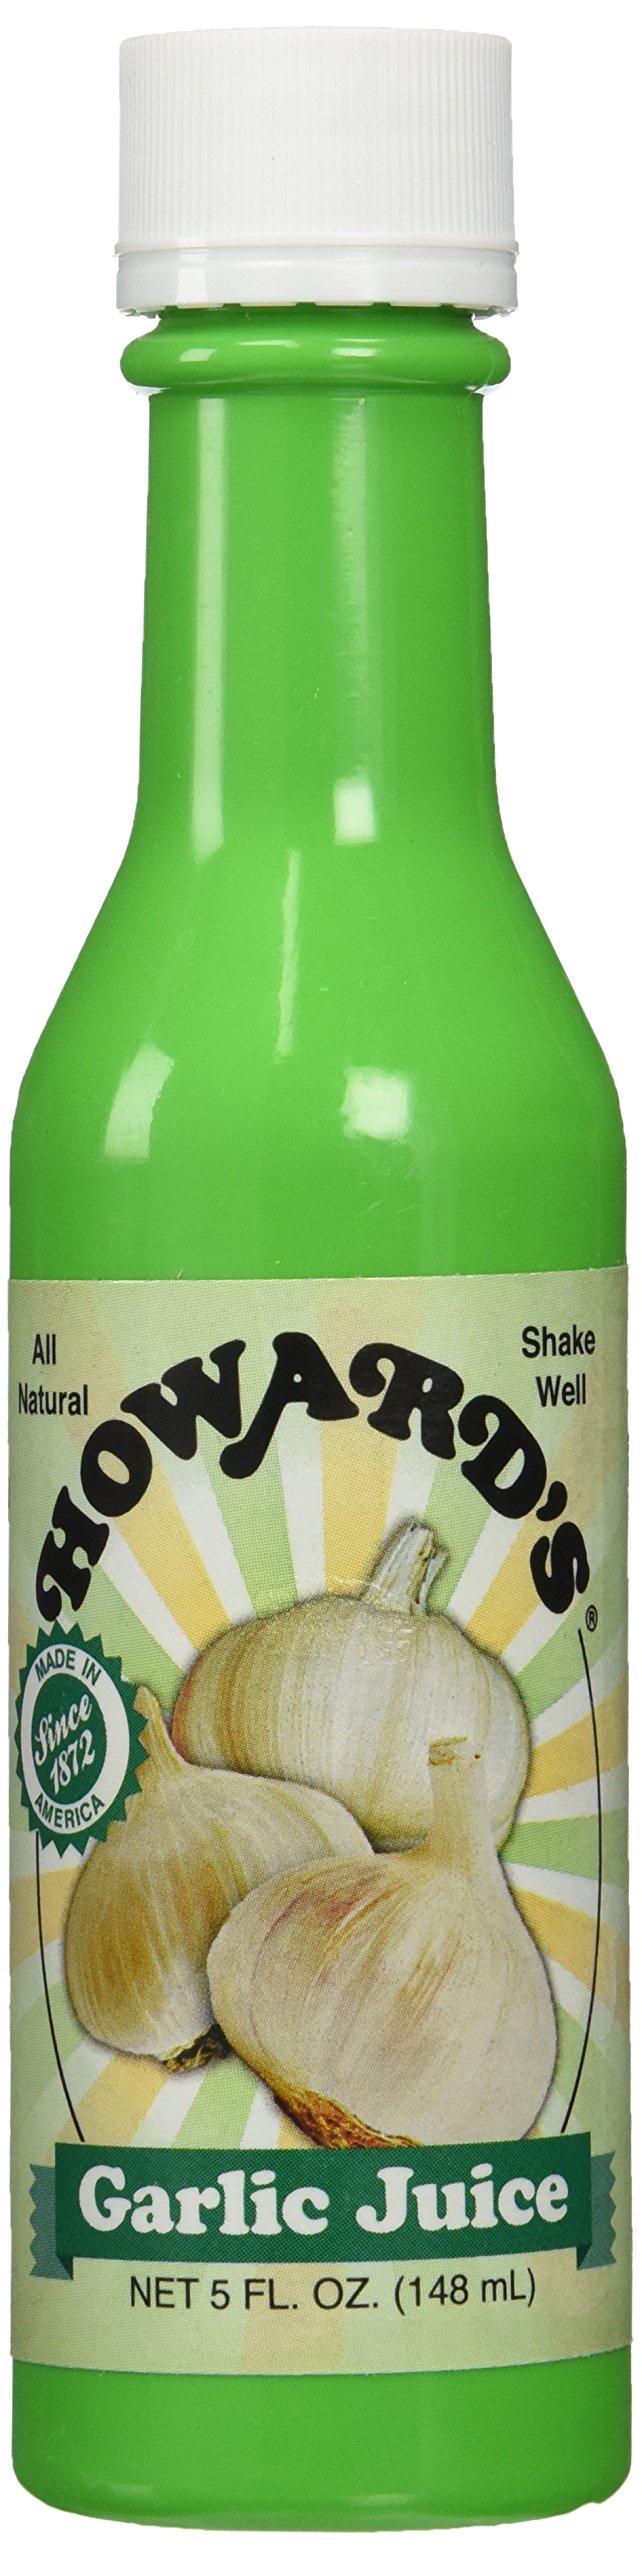 HOWARDS Garlic Juice Bottle, 5 Ounce